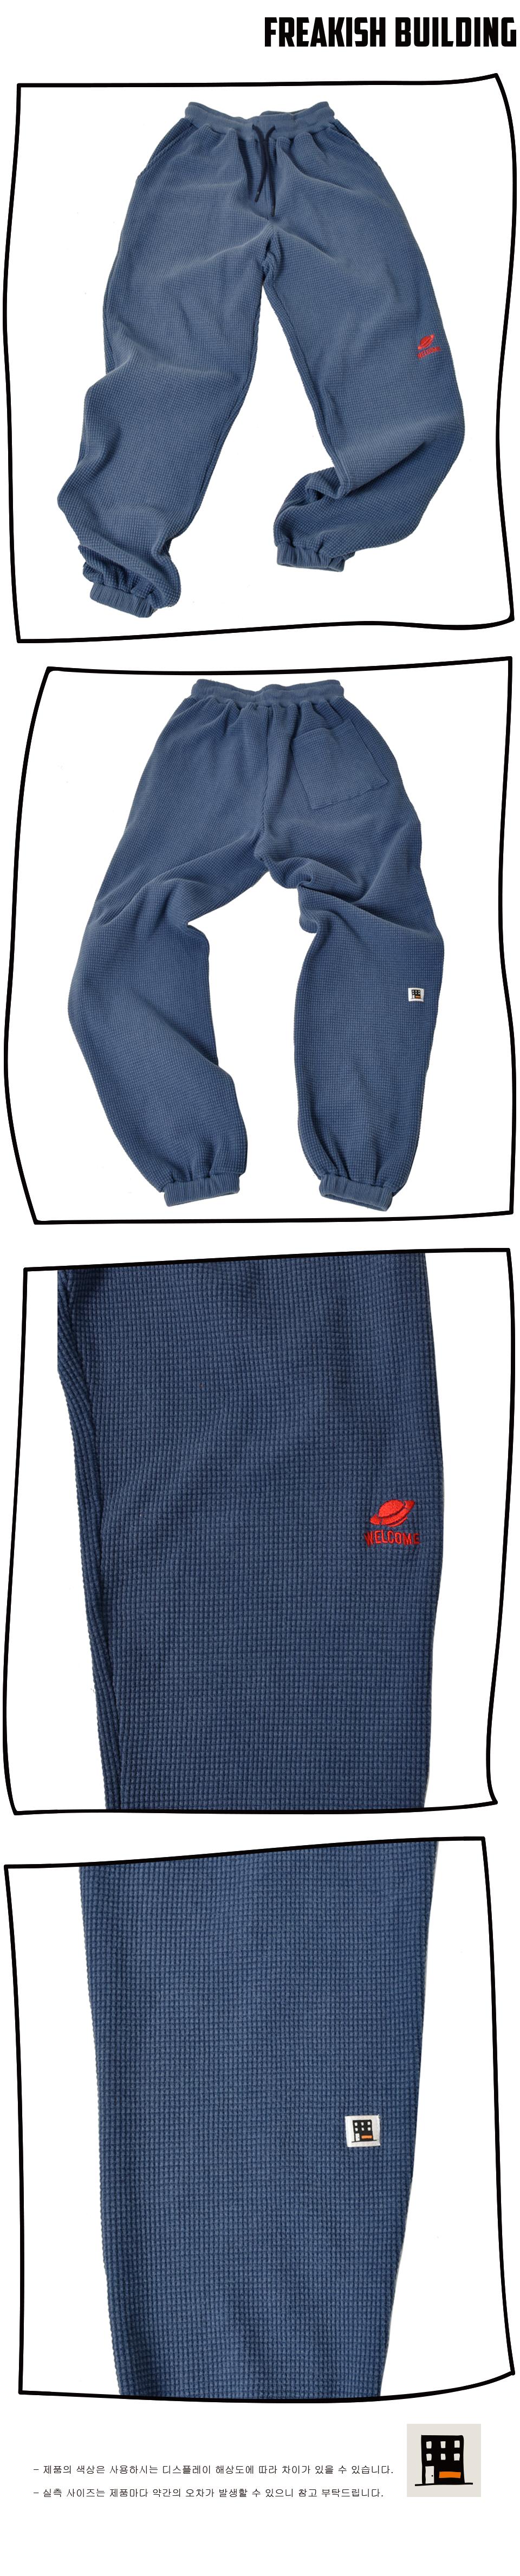 #03 FOLCOM WAFFLE LONG PANTS (NAVY) 03.jpg